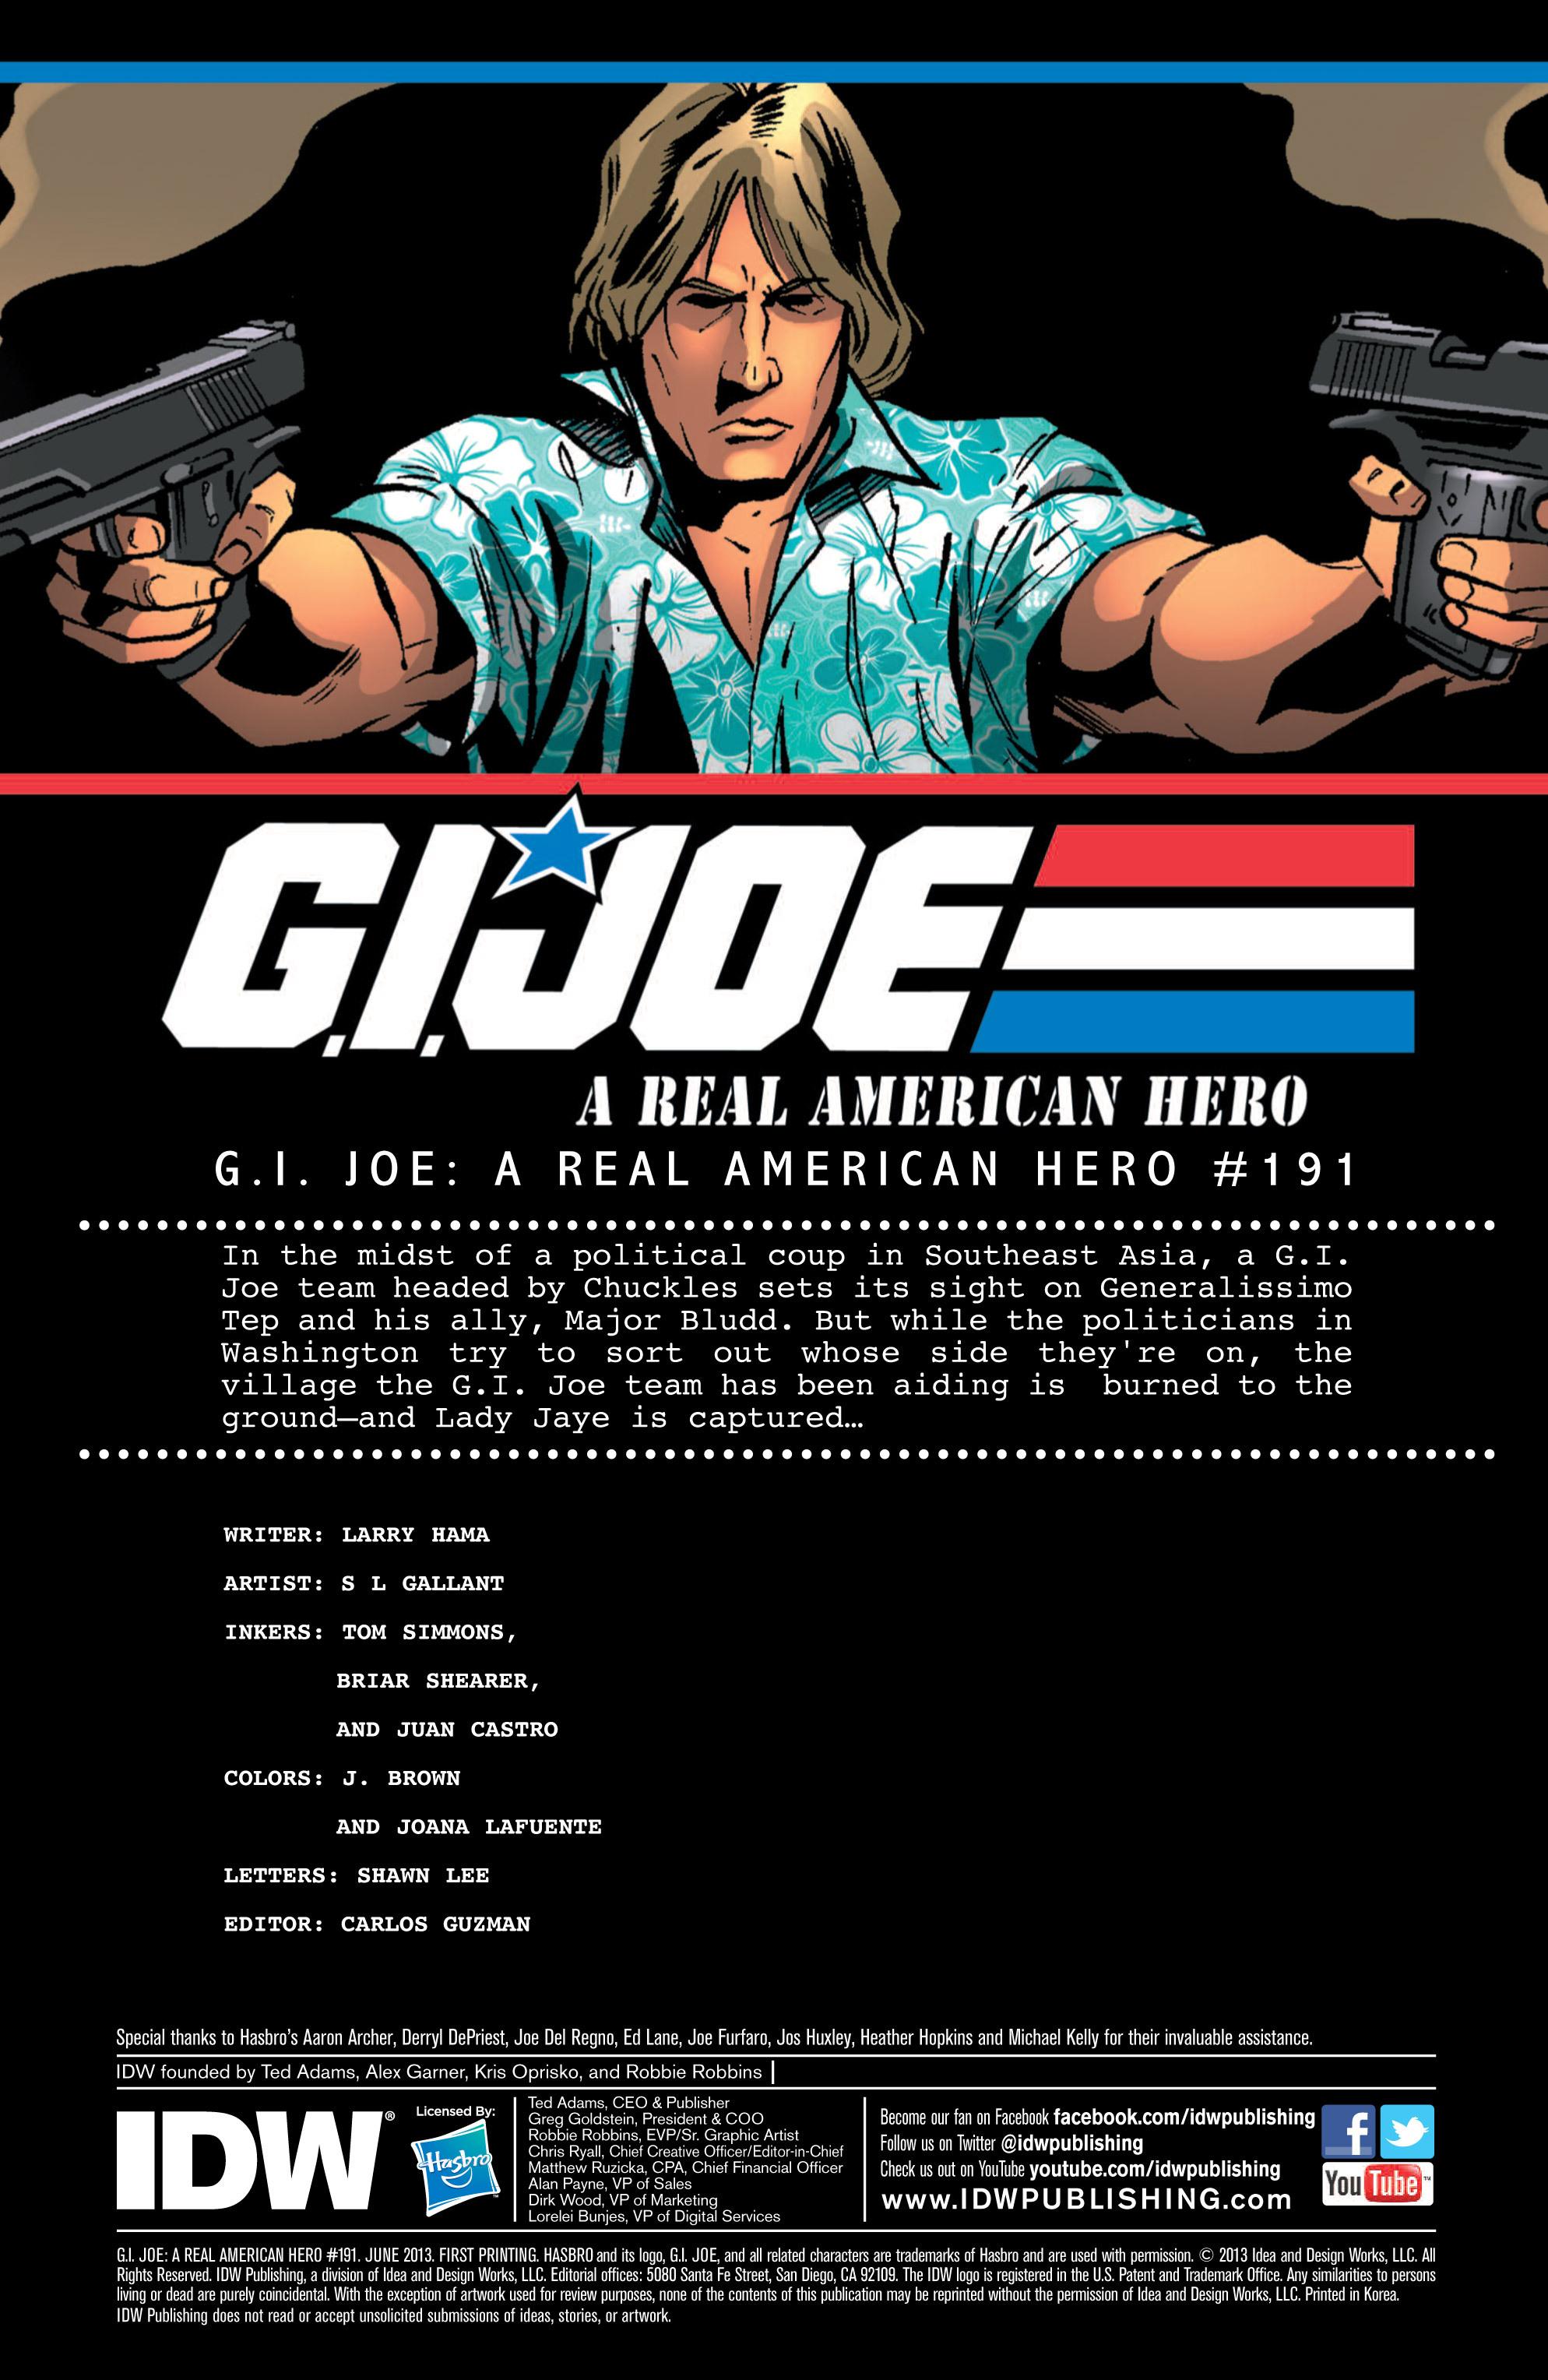 G.I. Joe: A Real American Hero 191 Page 1